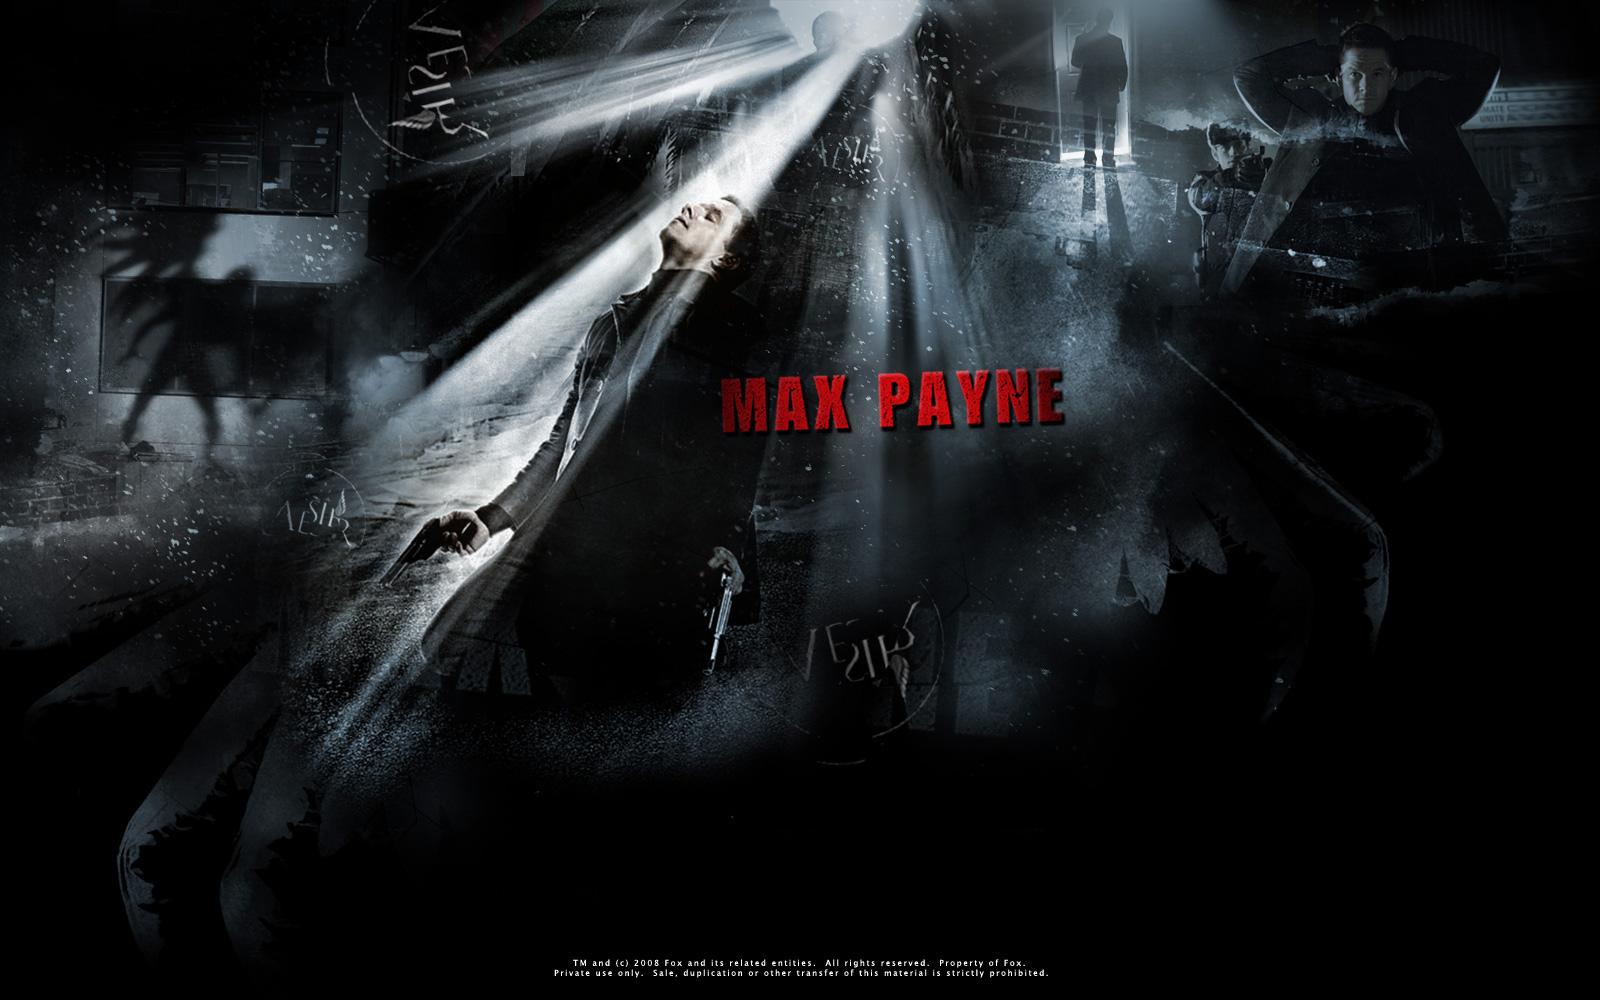 Max Payne Movie Wallpapers Desktop Wallpapers 1600x1000